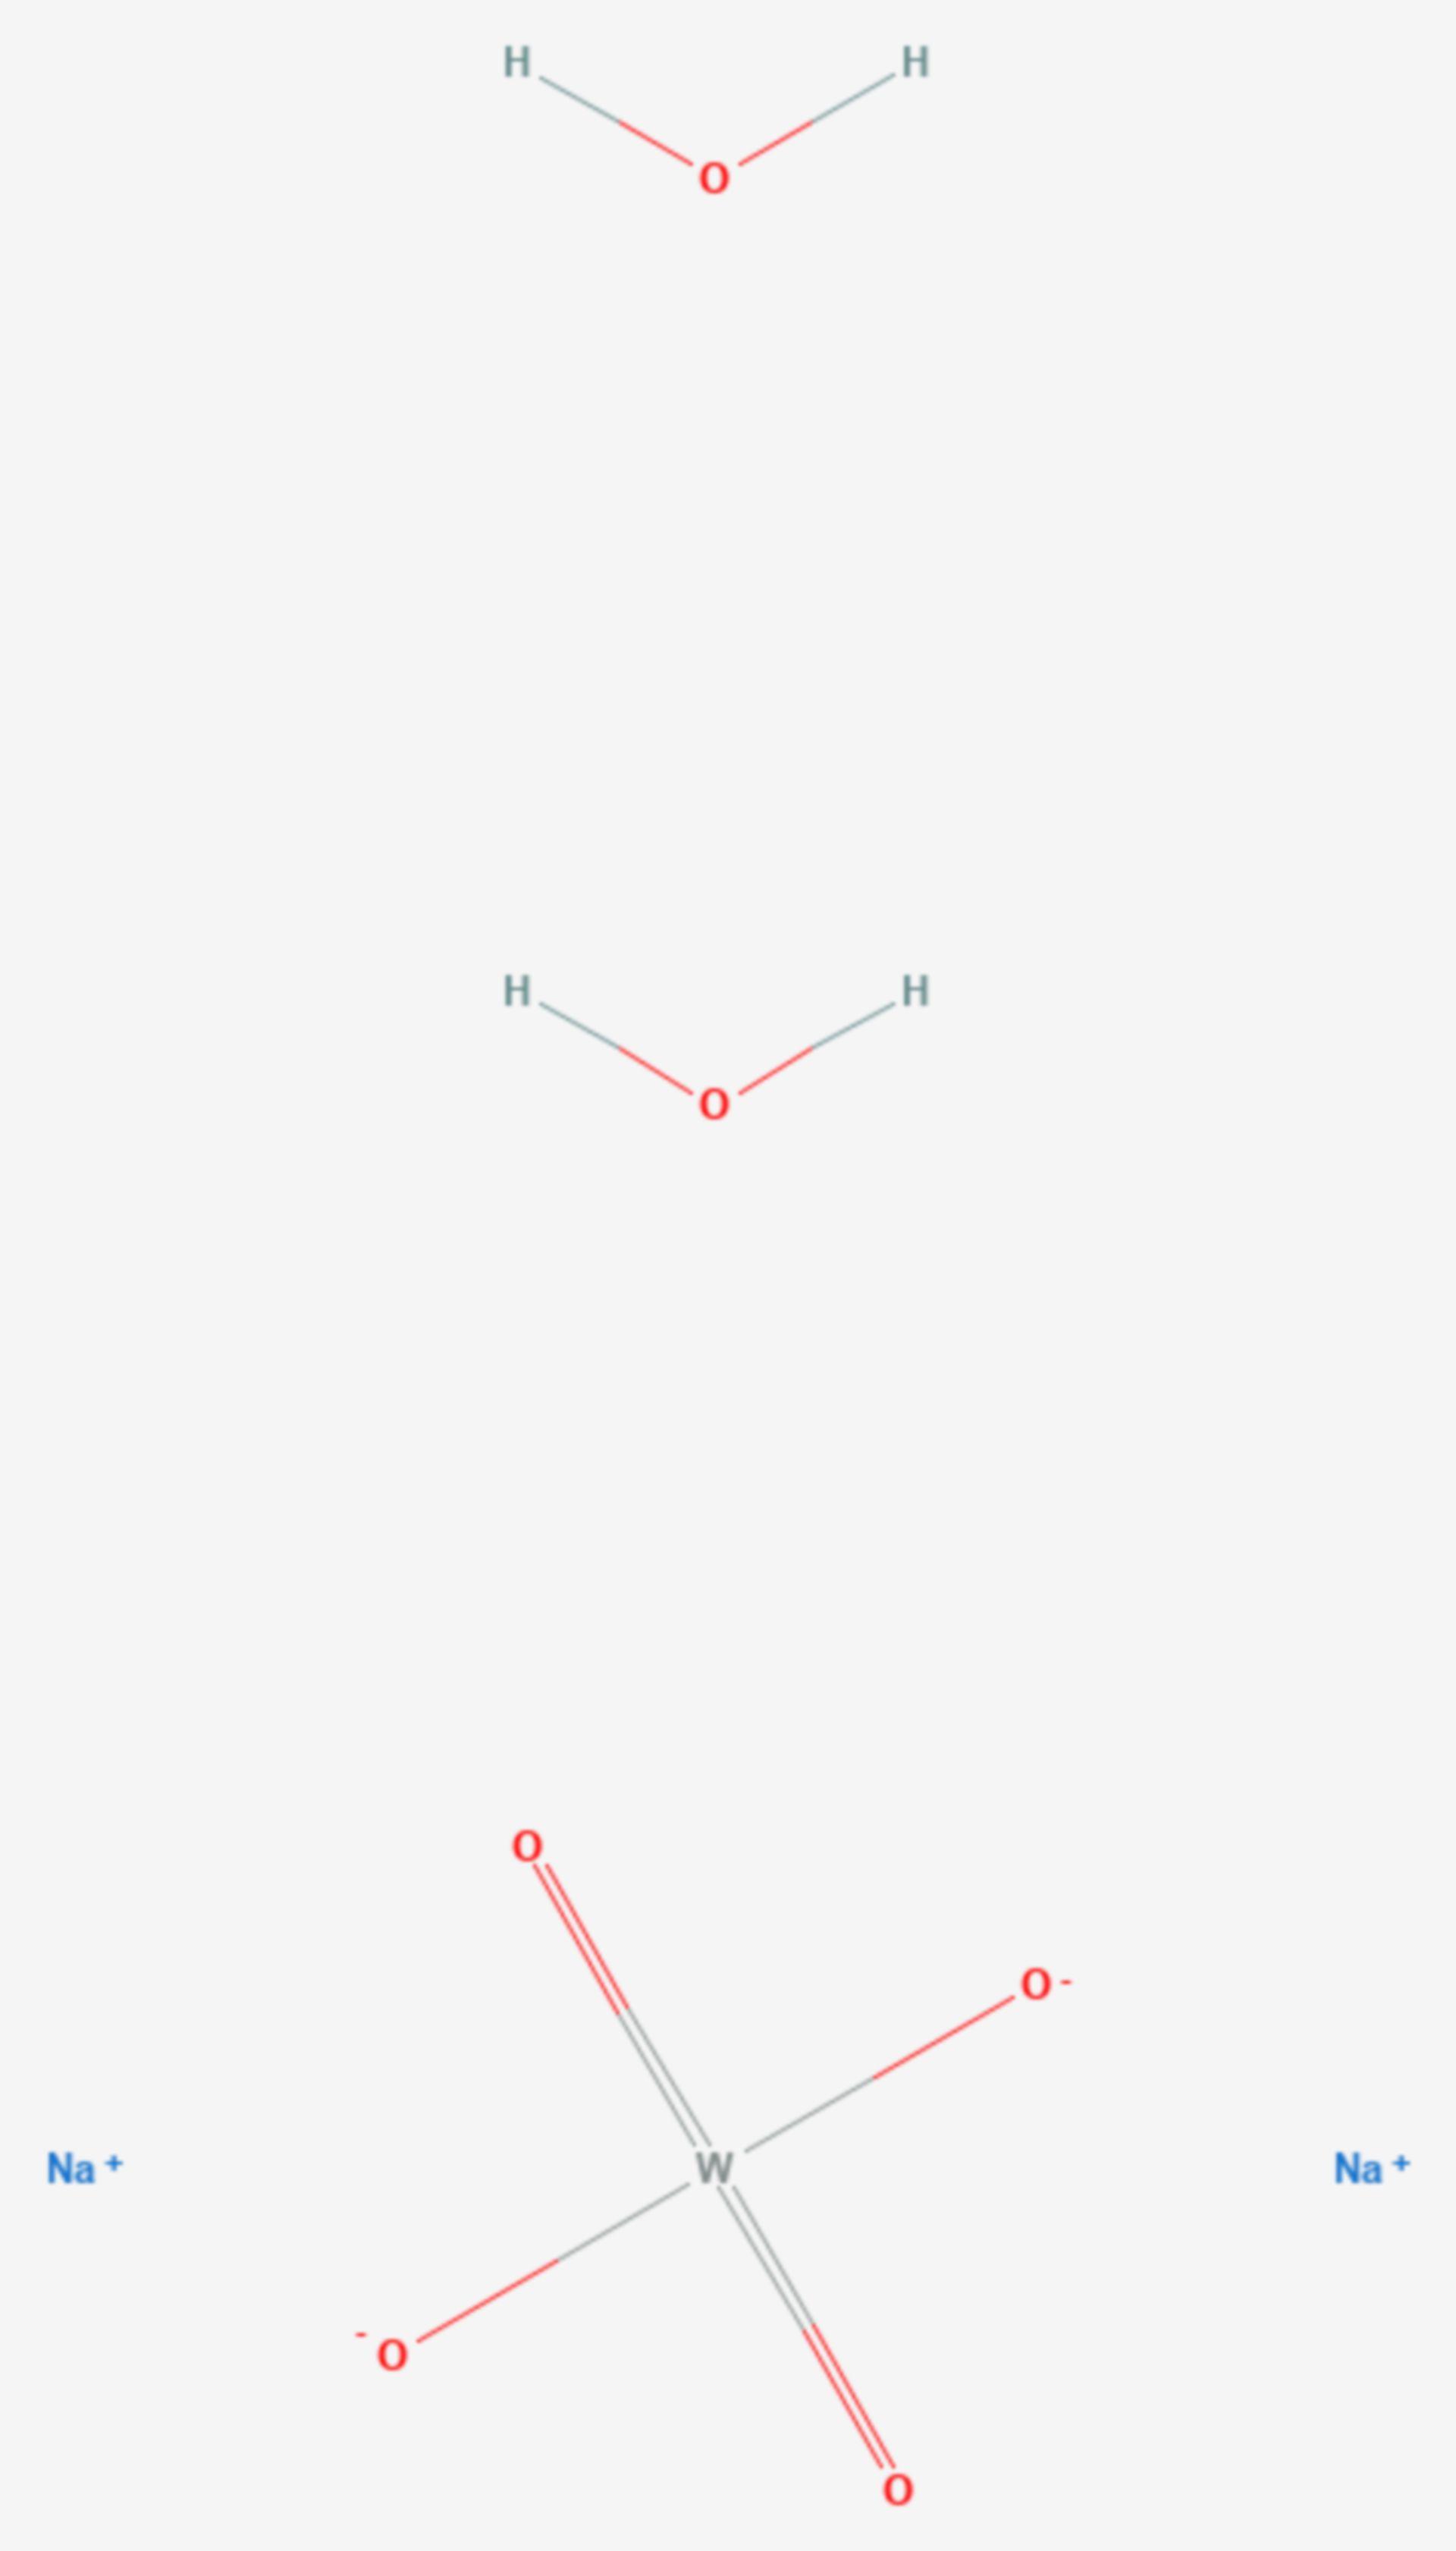 Natriumwolframat (Strukturformel)